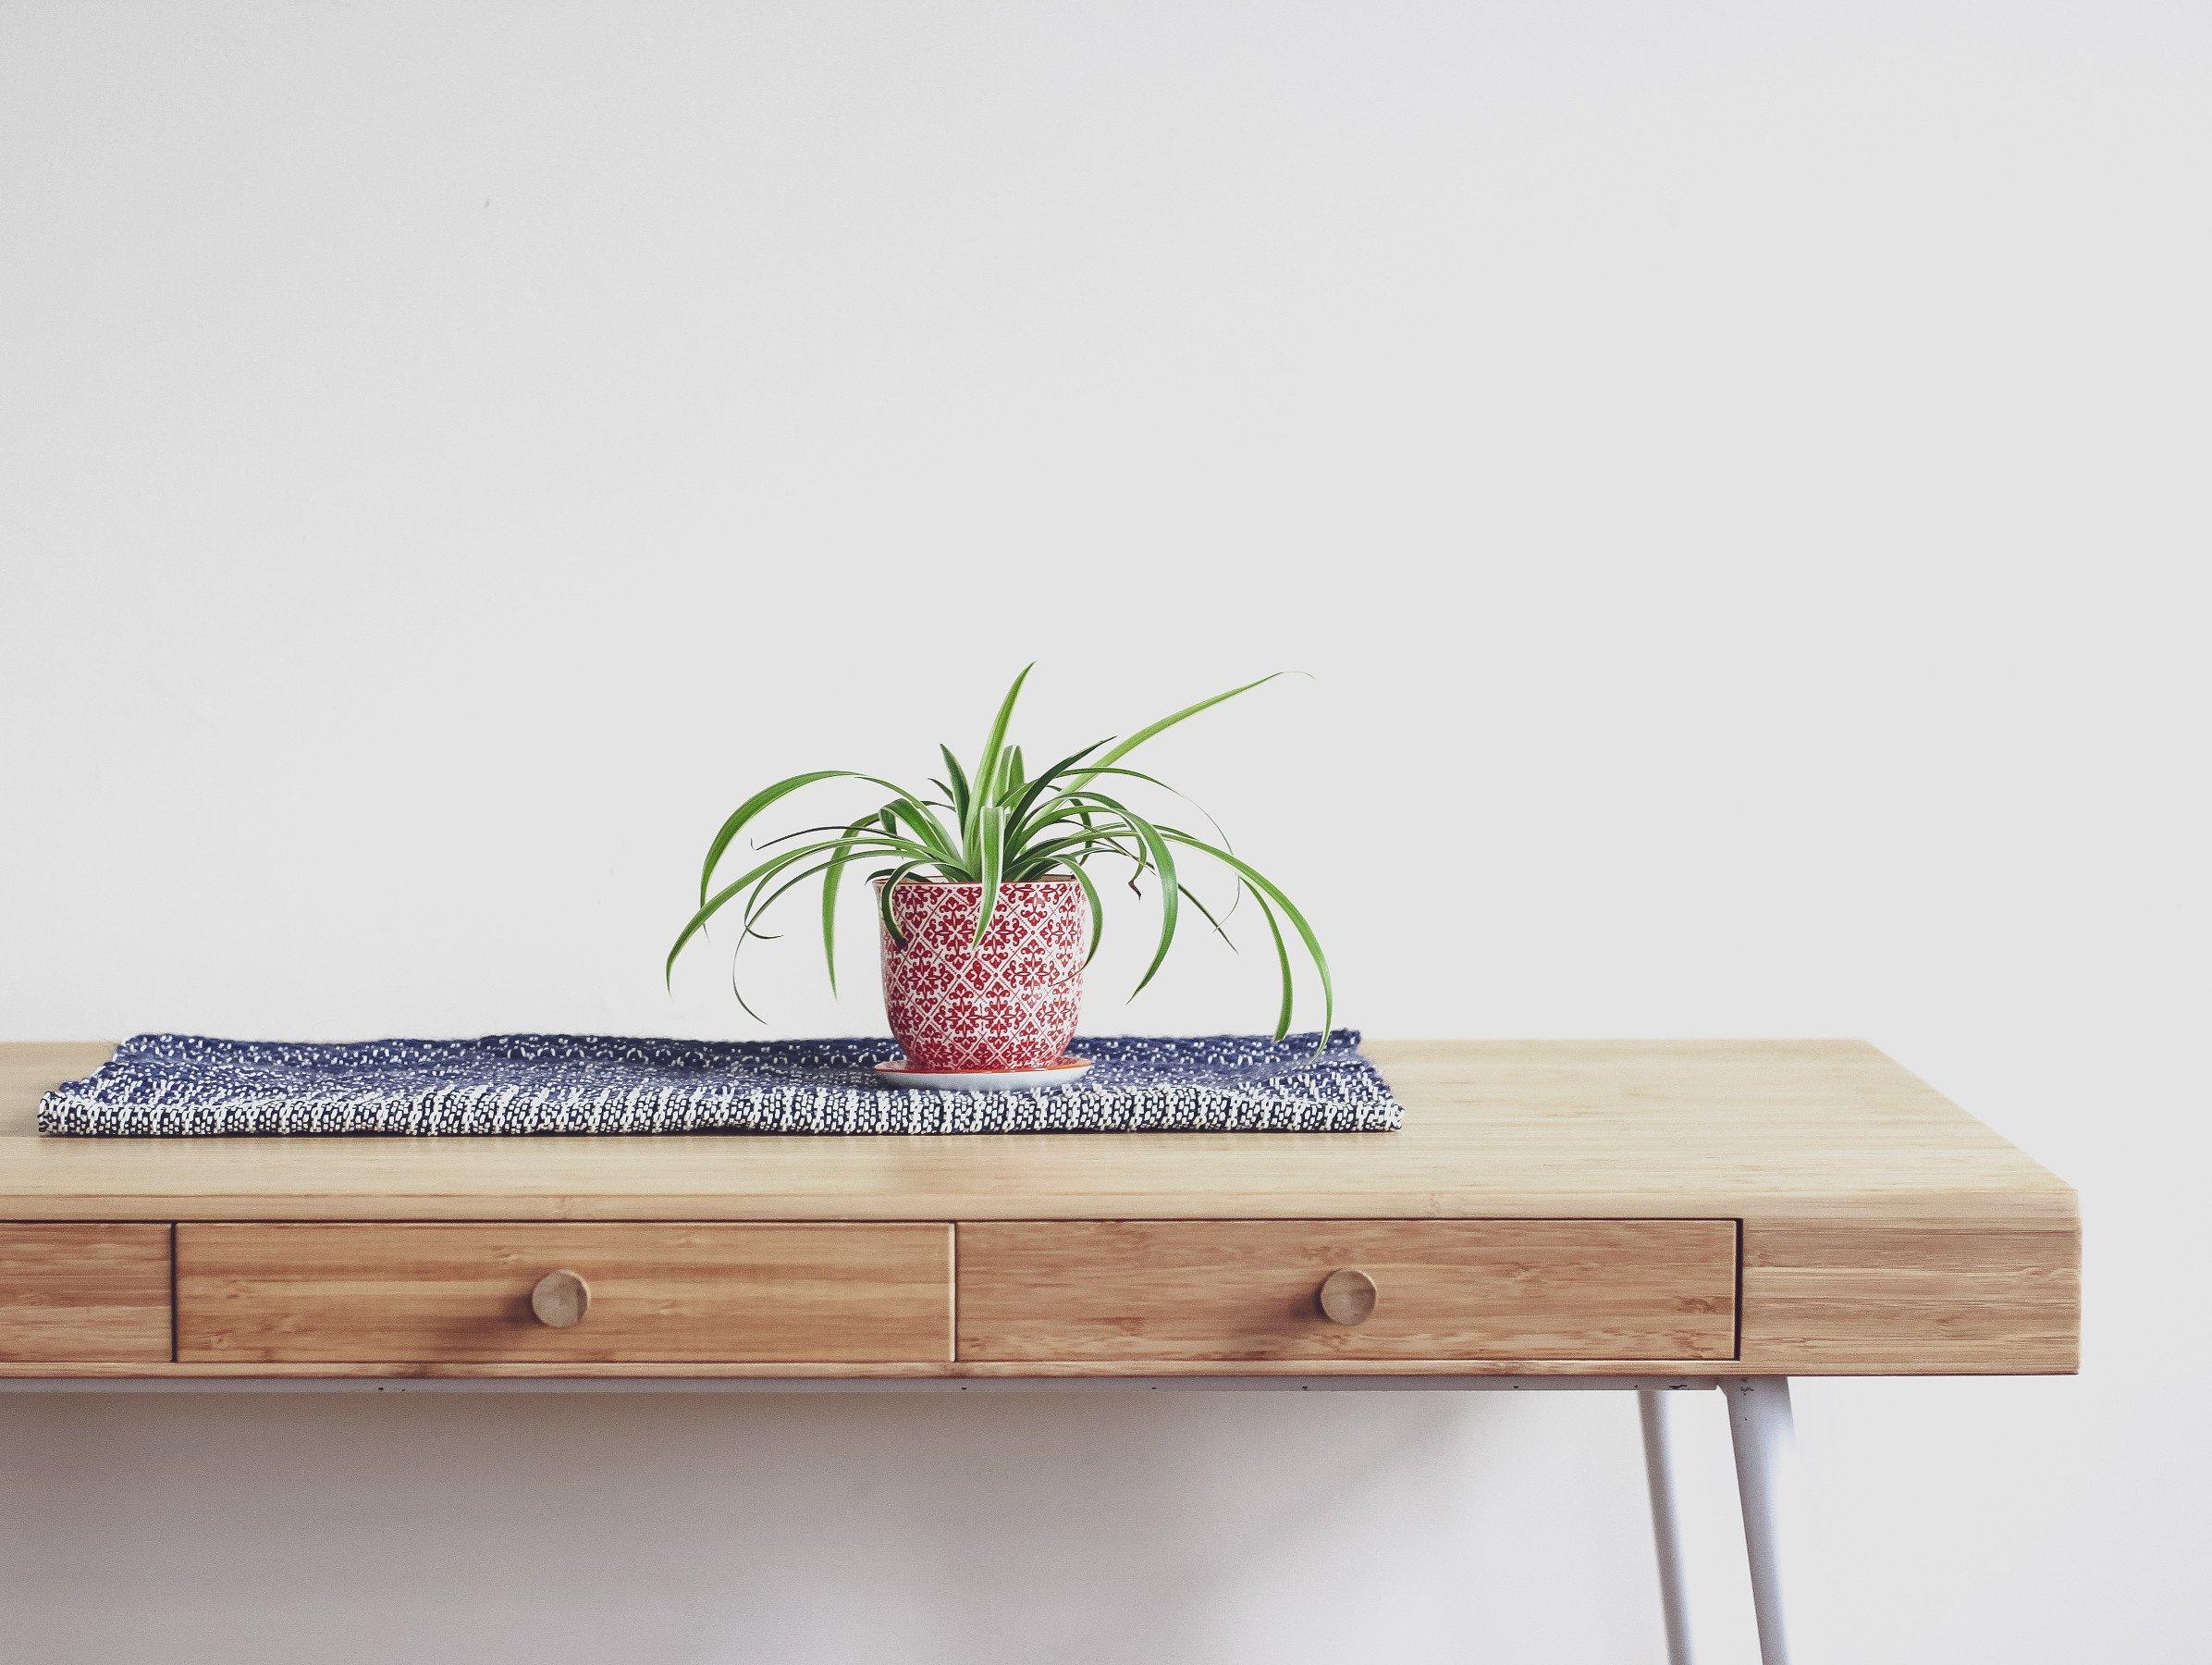 living is easy deutsches design hauptsache funktional. Black Bedroom Furniture Sets. Home Design Ideas